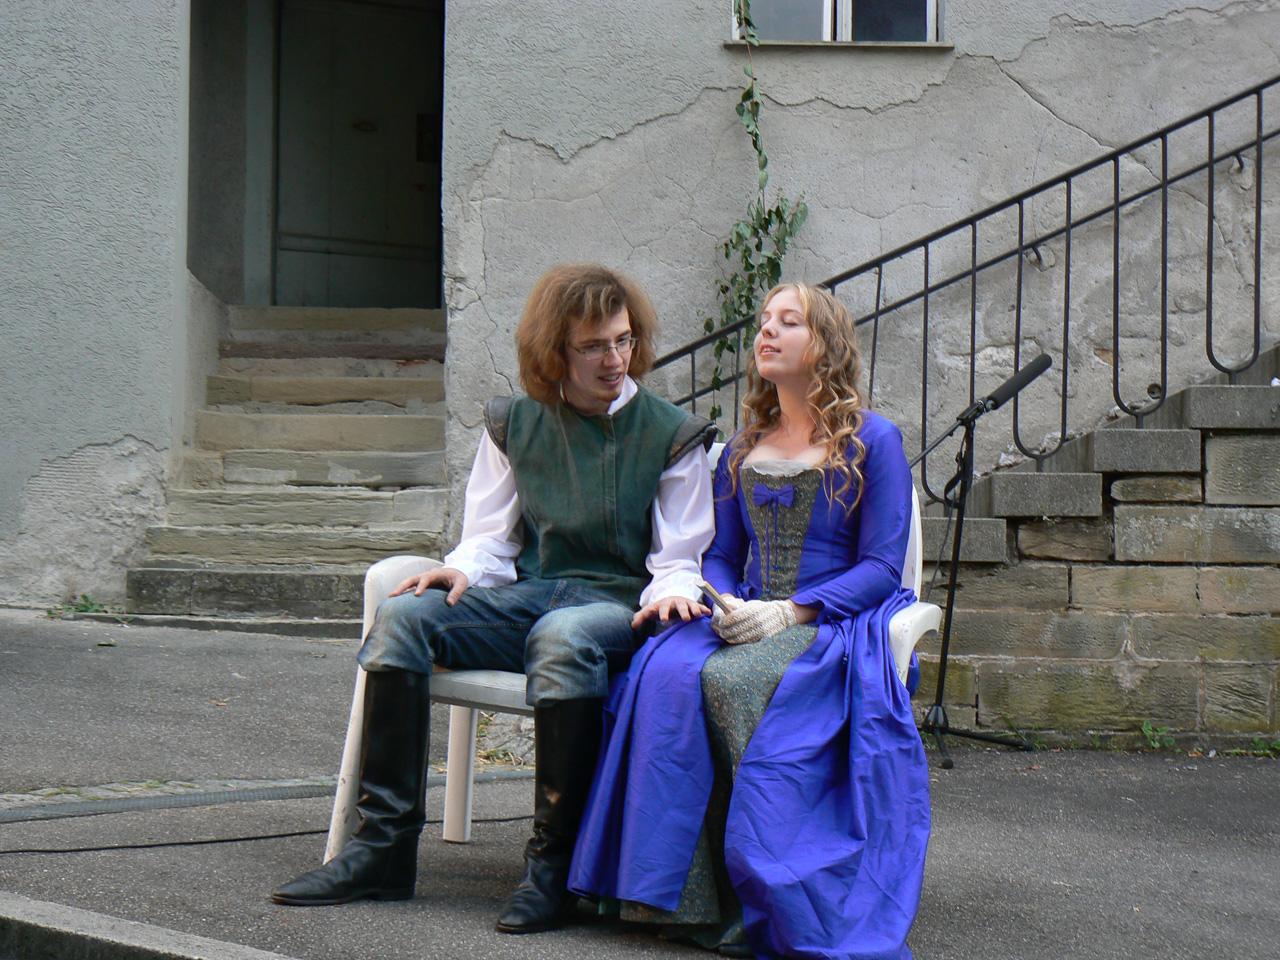 2007: Christian in Cyrano von Bergerac